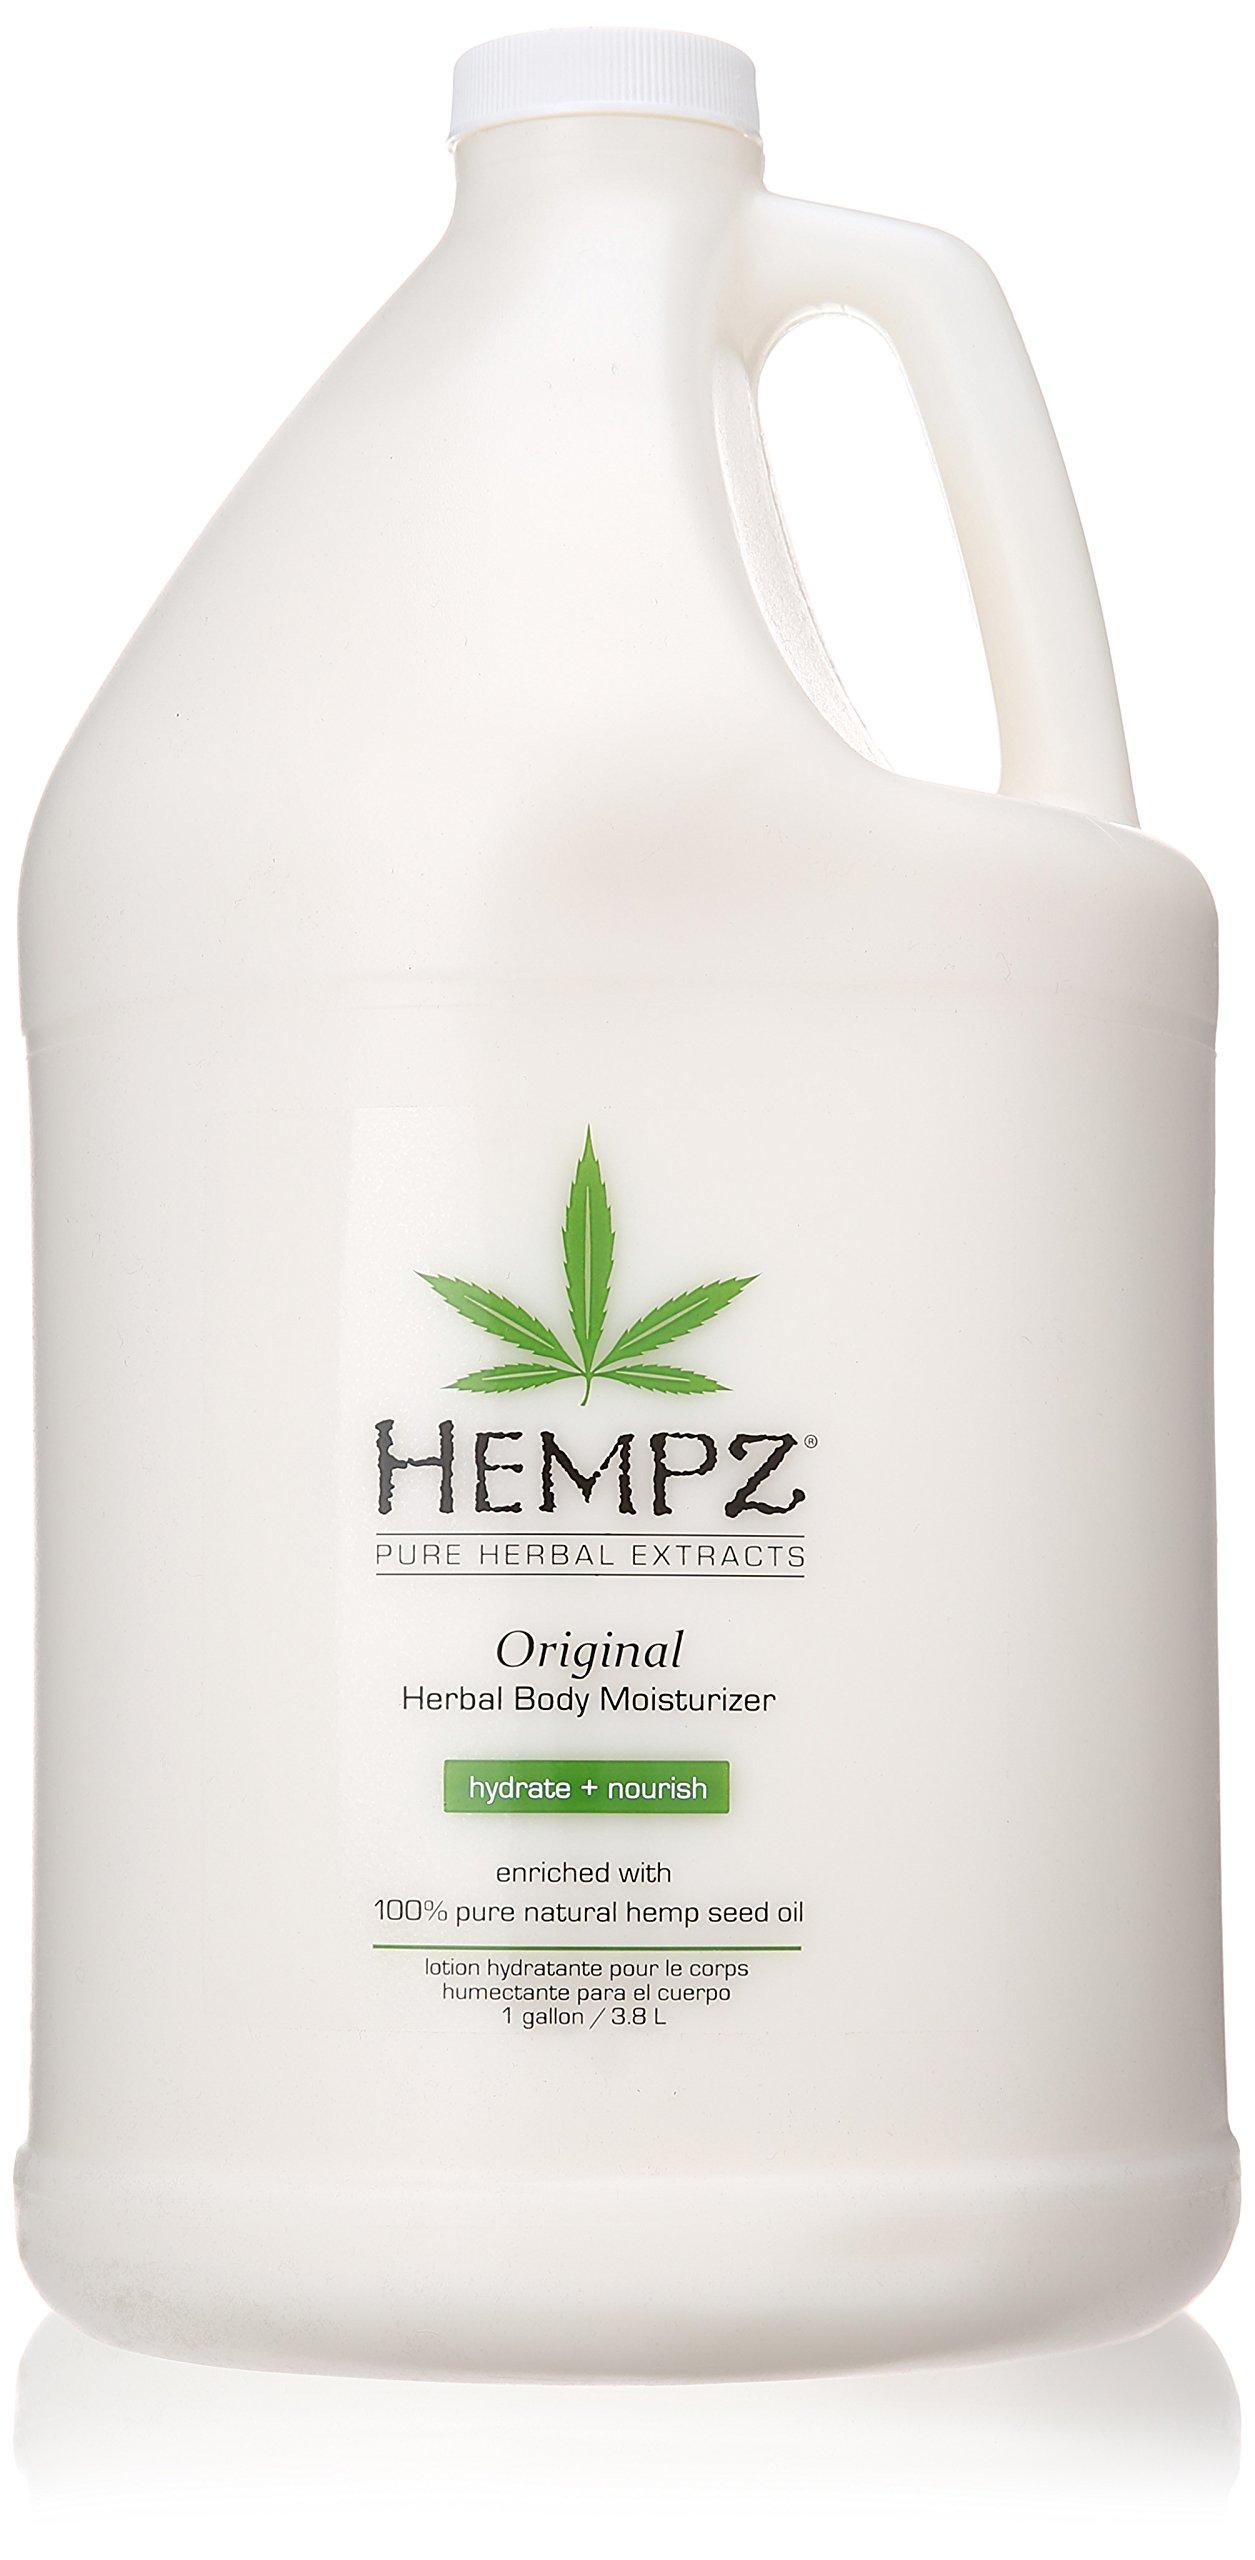 Hempz Moisturizer Lotion Gallon, 128 Ounce by Hempz (Image #1)